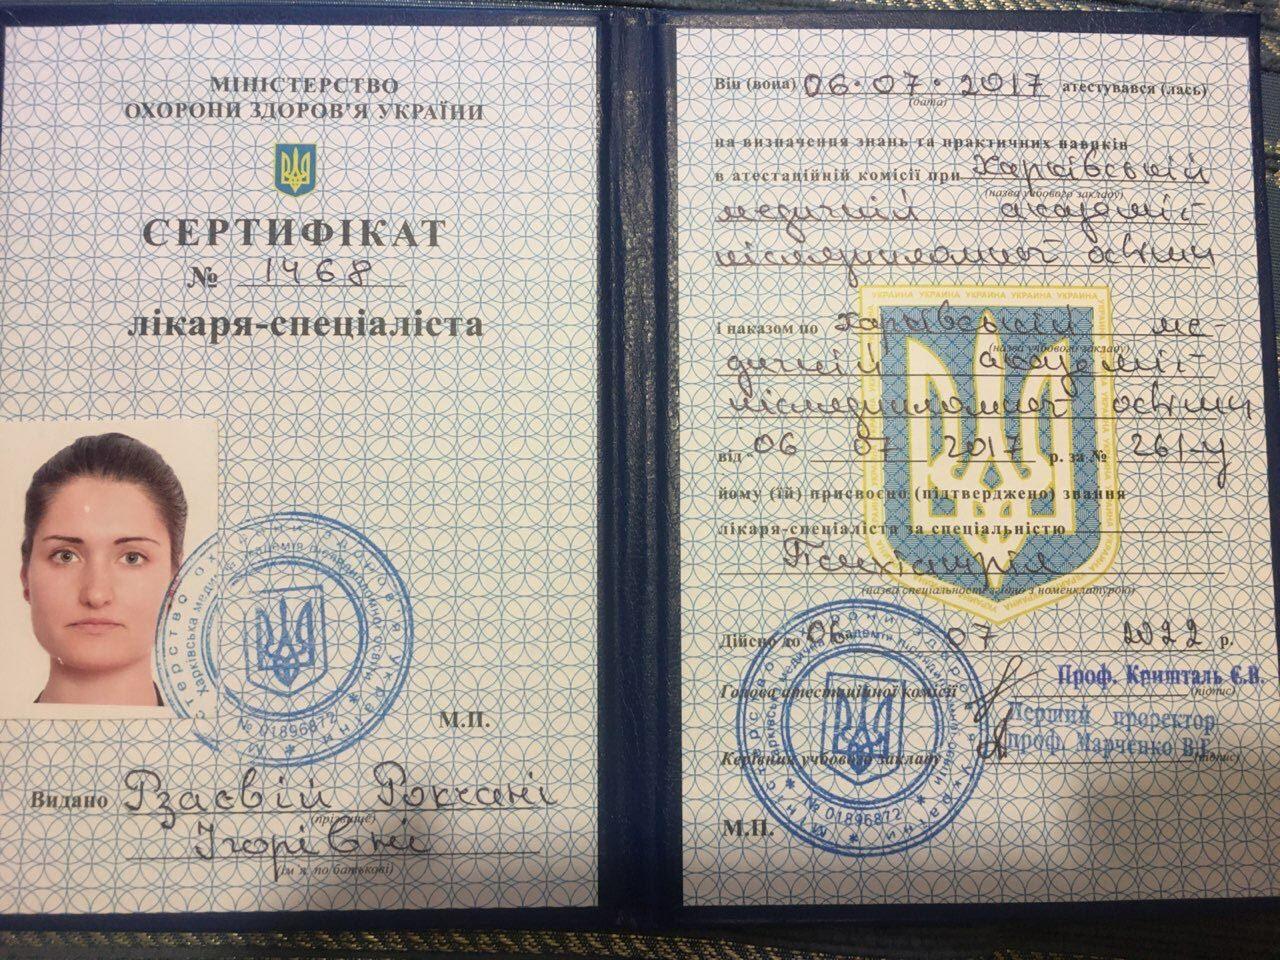 Рзаєва Роксана - фото № 6